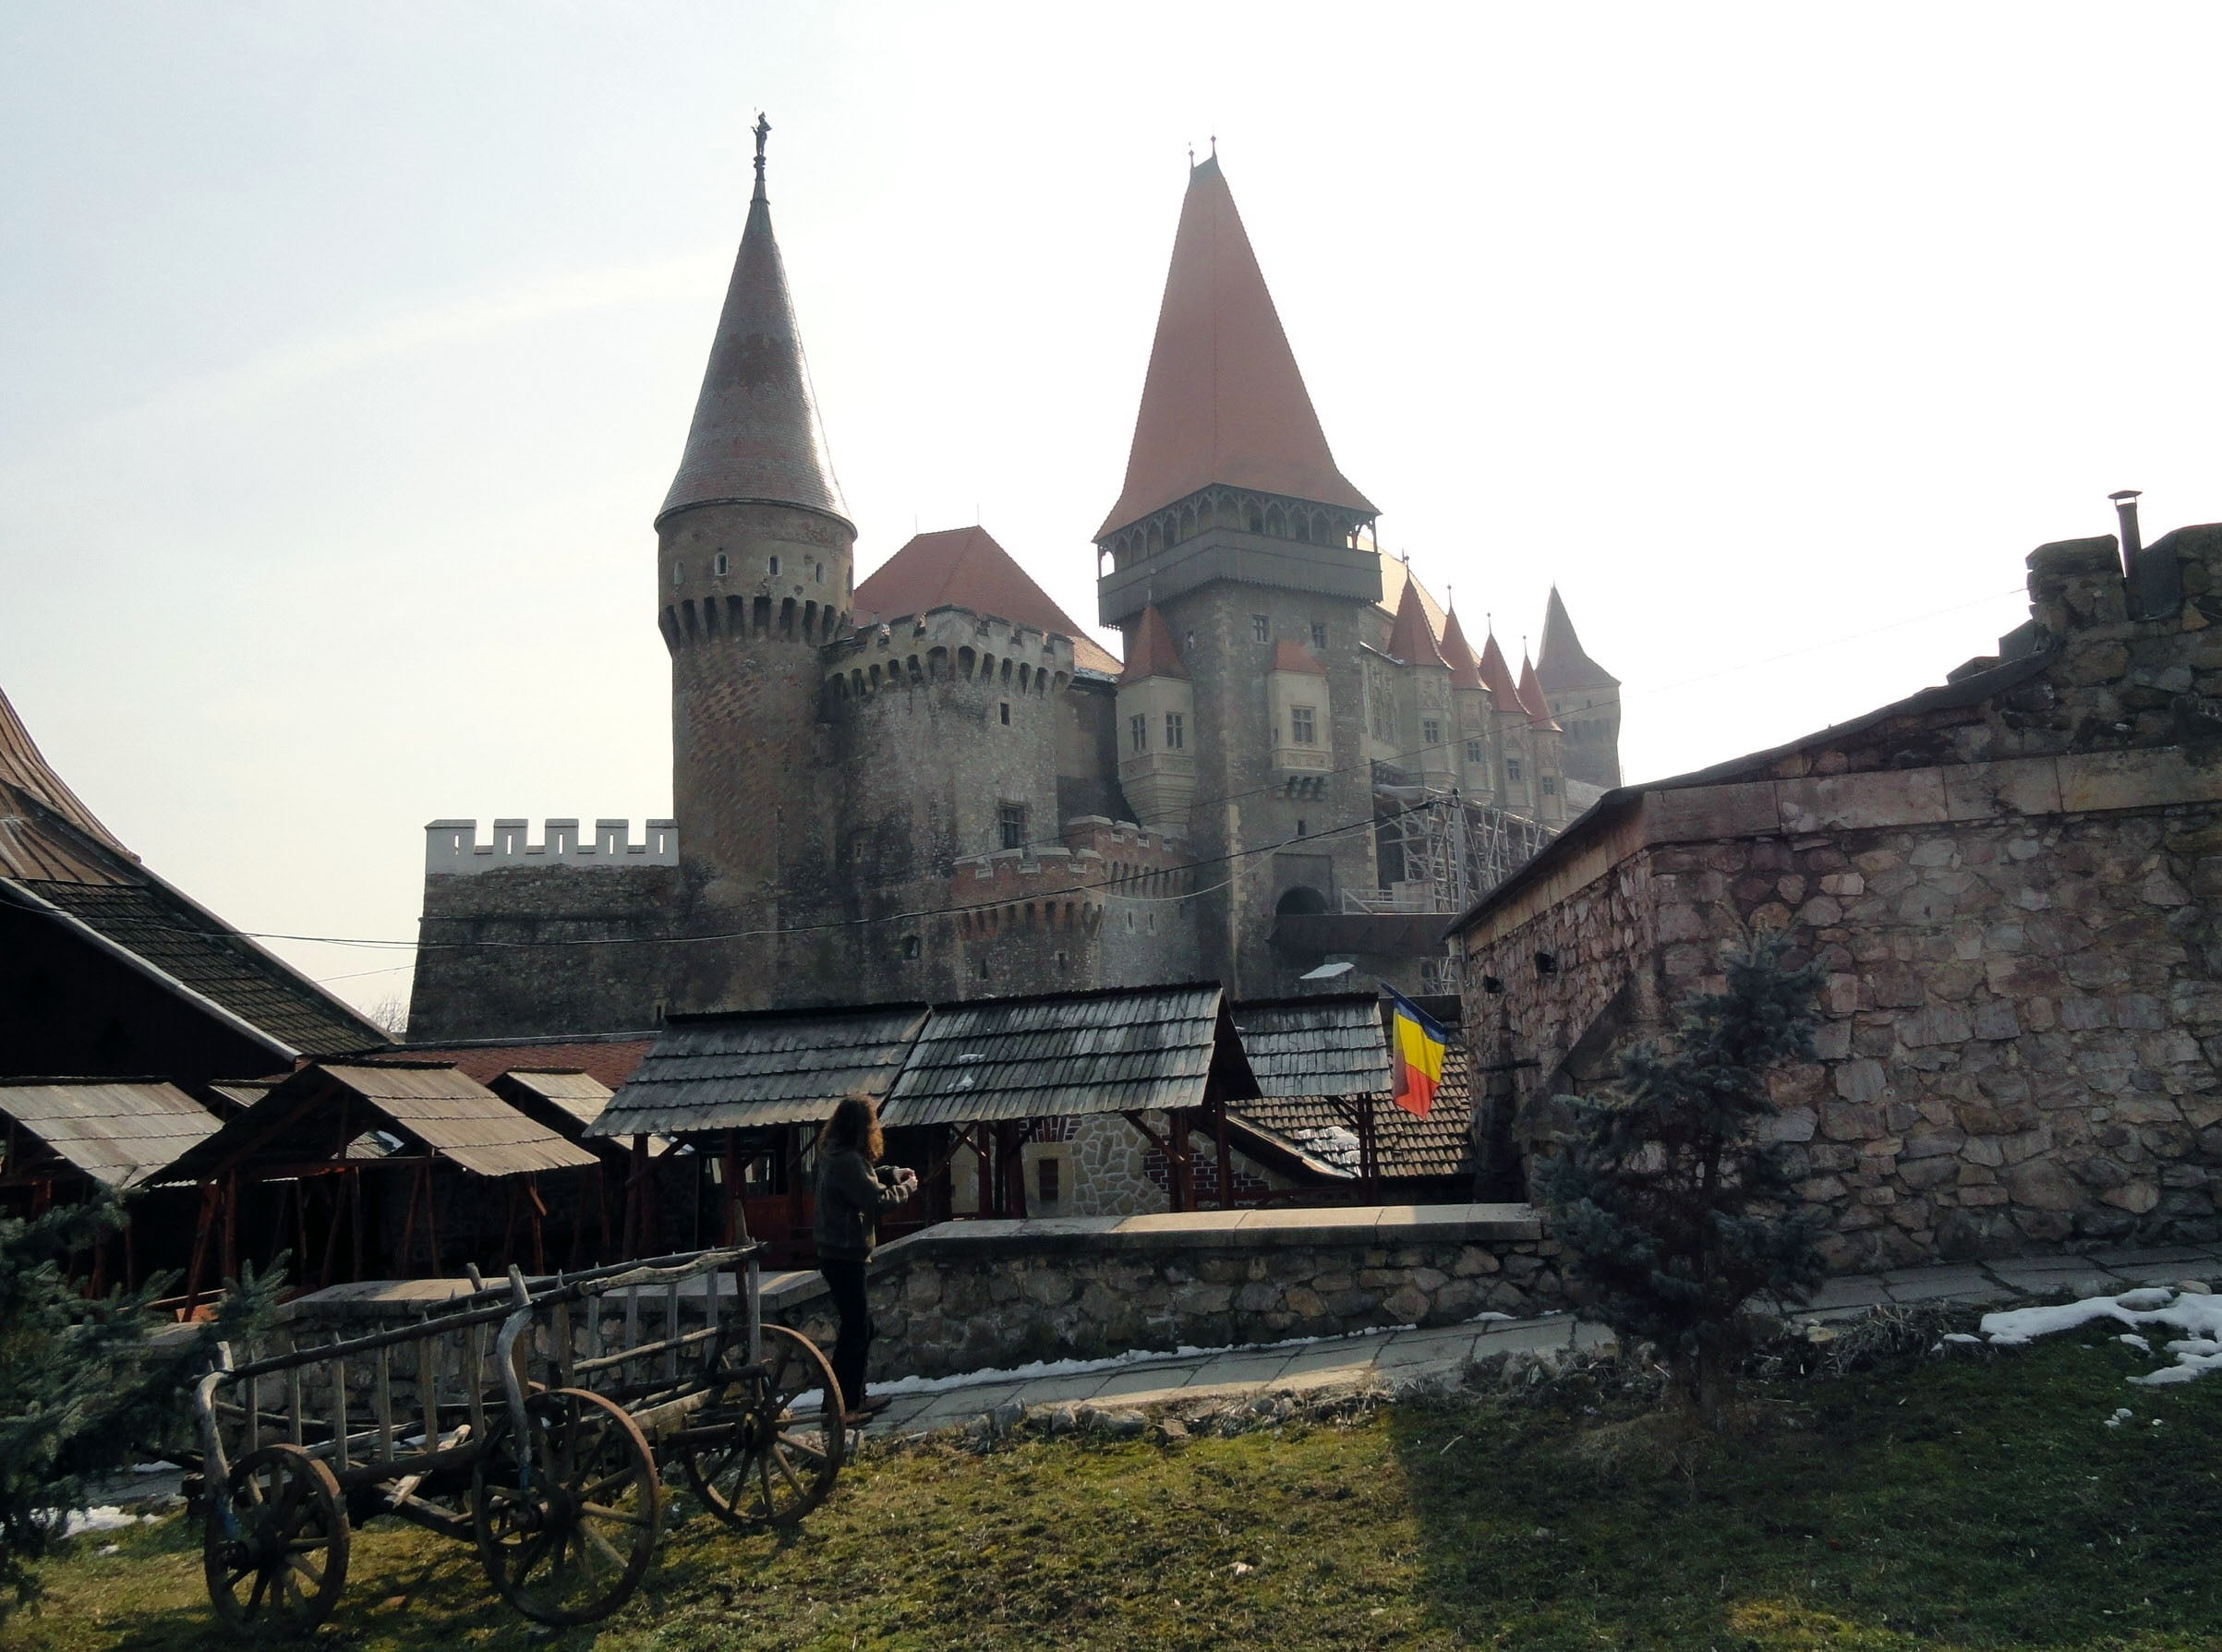 Rumunija_Hunedoara_Obilazak_Izlet_autobusom_akcija_first_minute